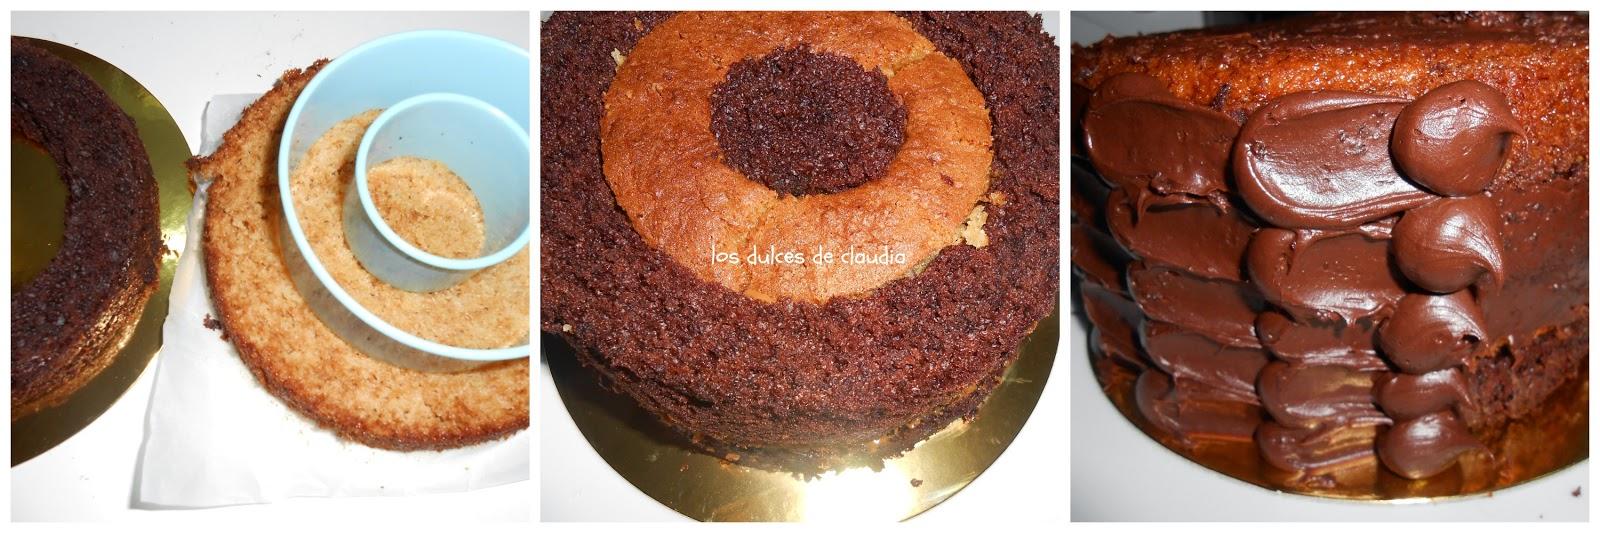 torta damero